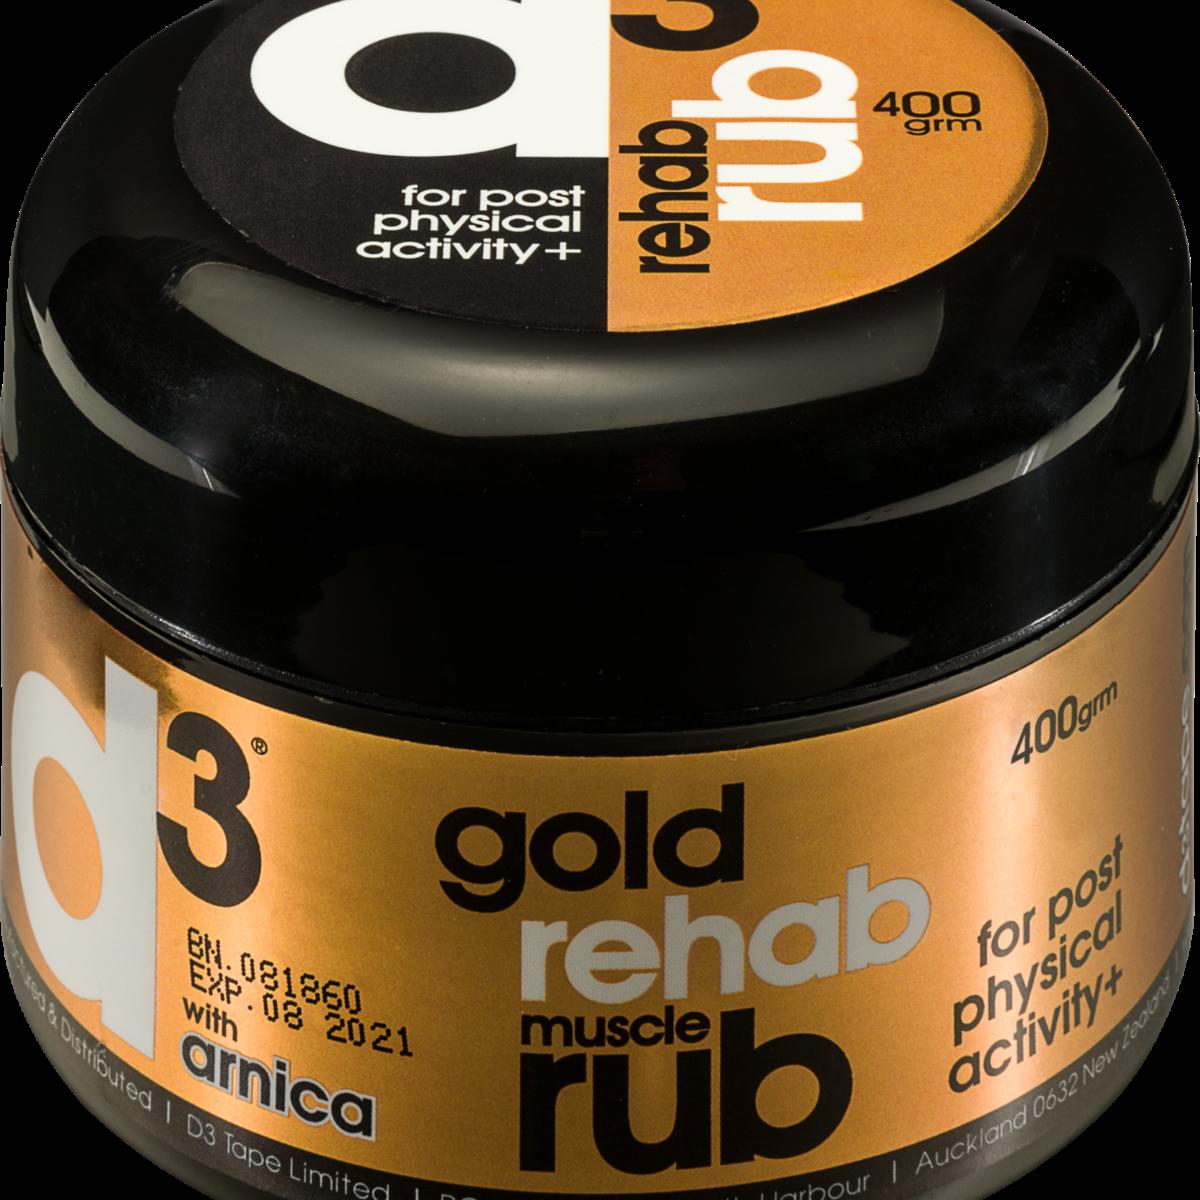 d3 Gold Rehab Muscle Rub